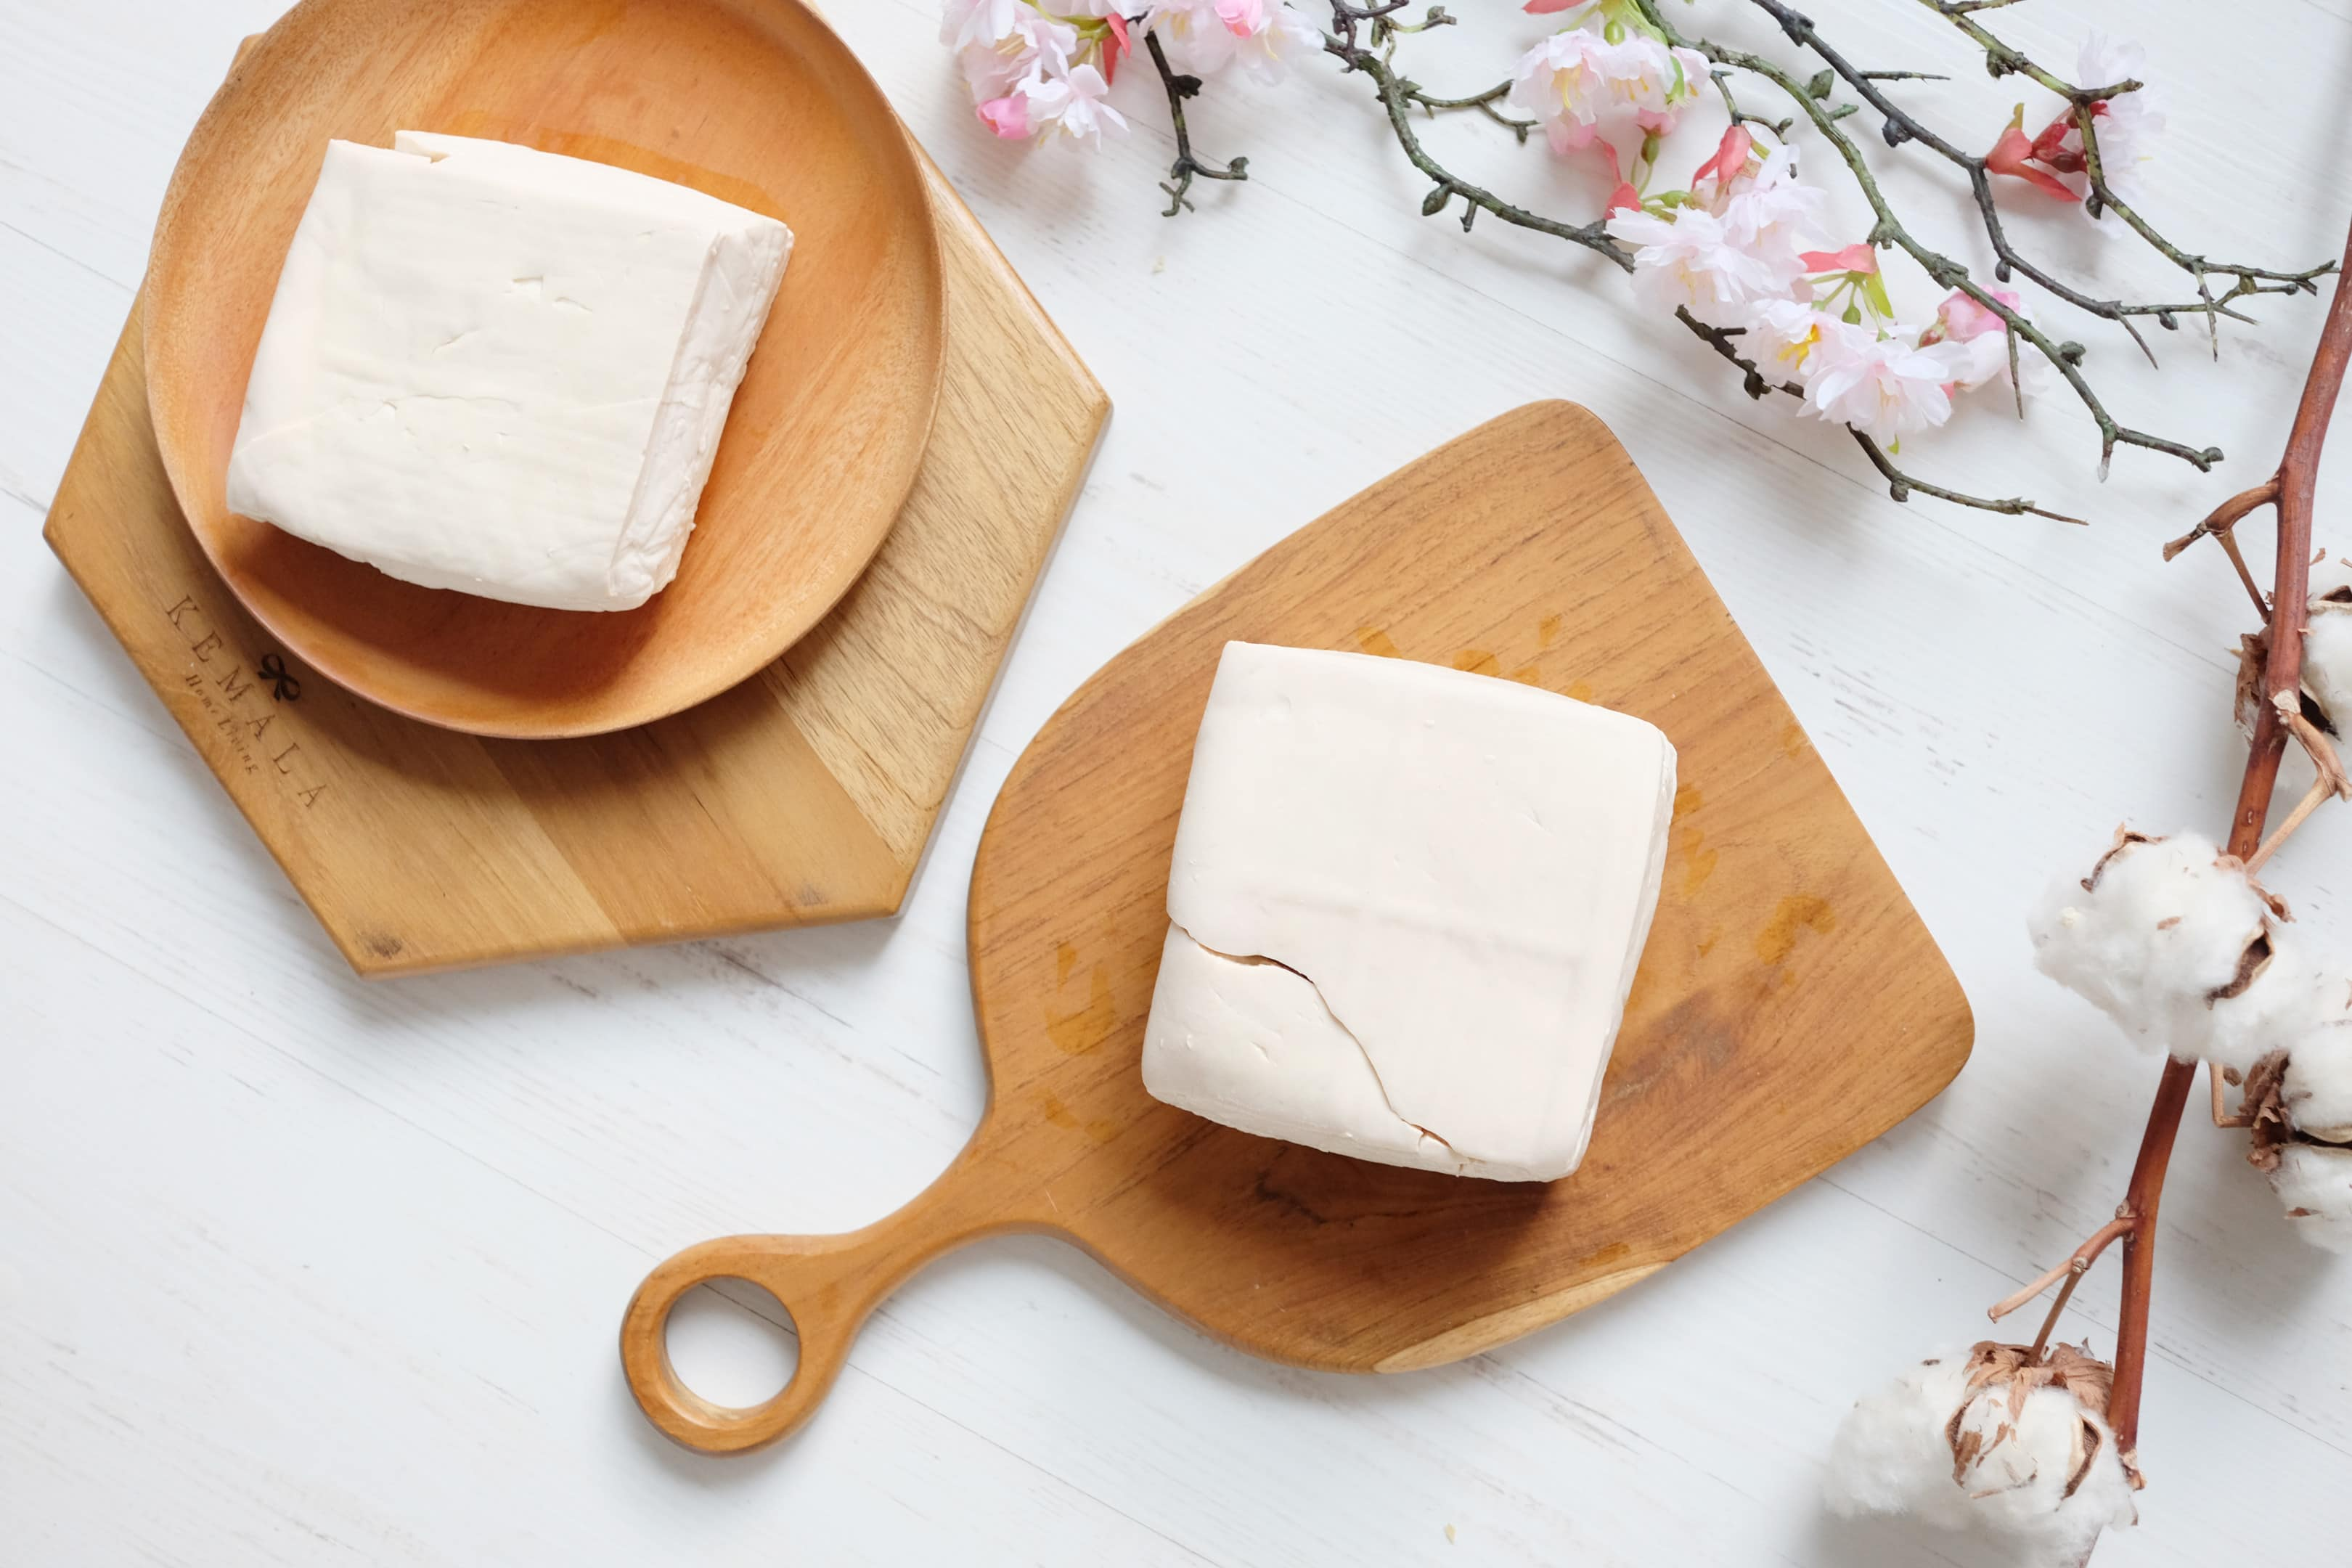 White raw tofu on wooden board